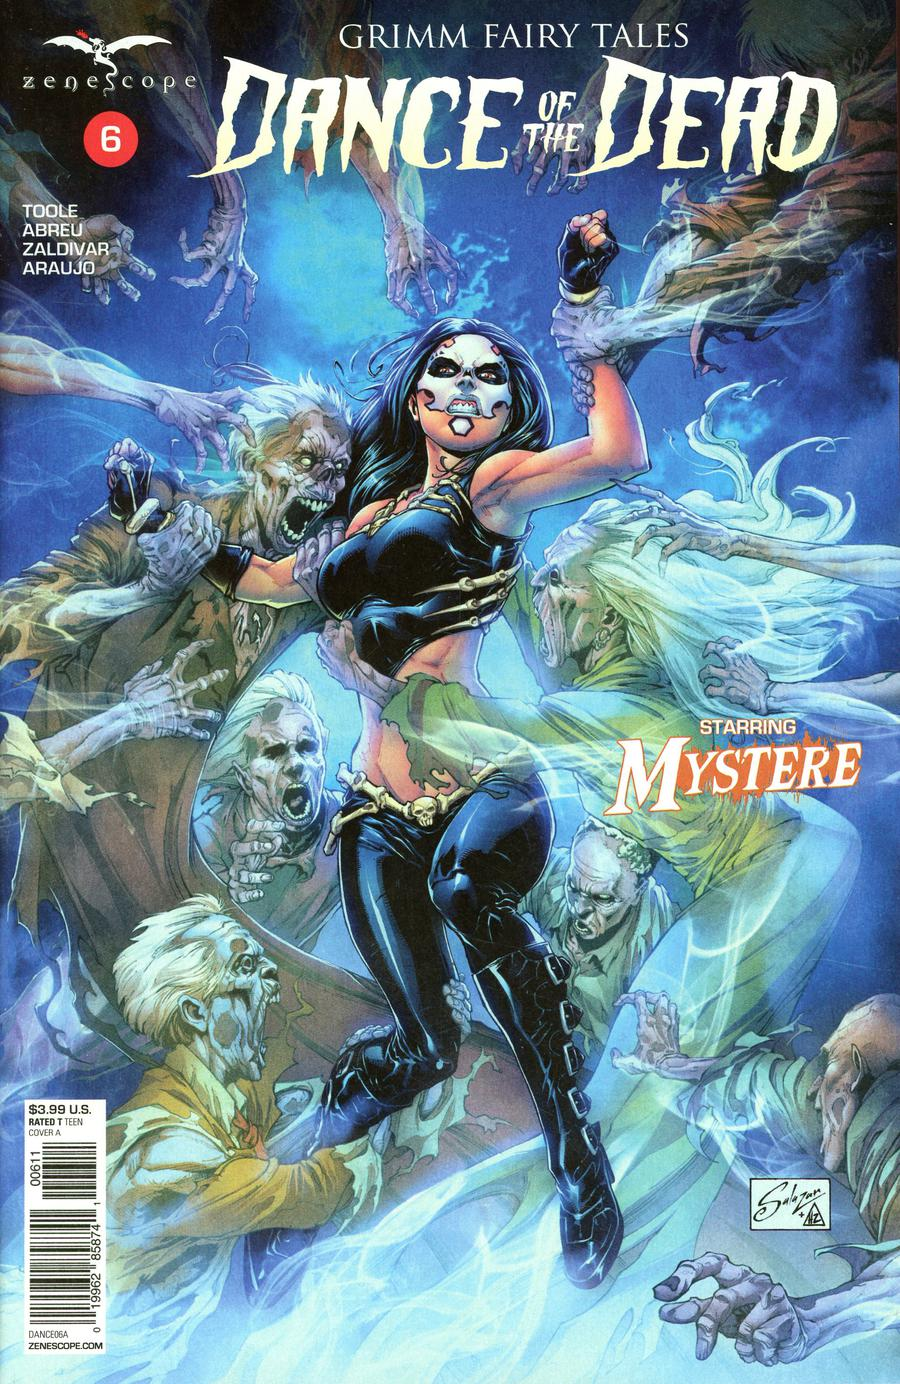 Grimm Fairy Tales Presents Dance Of The Dead #6 Cover A Edgar Salazar